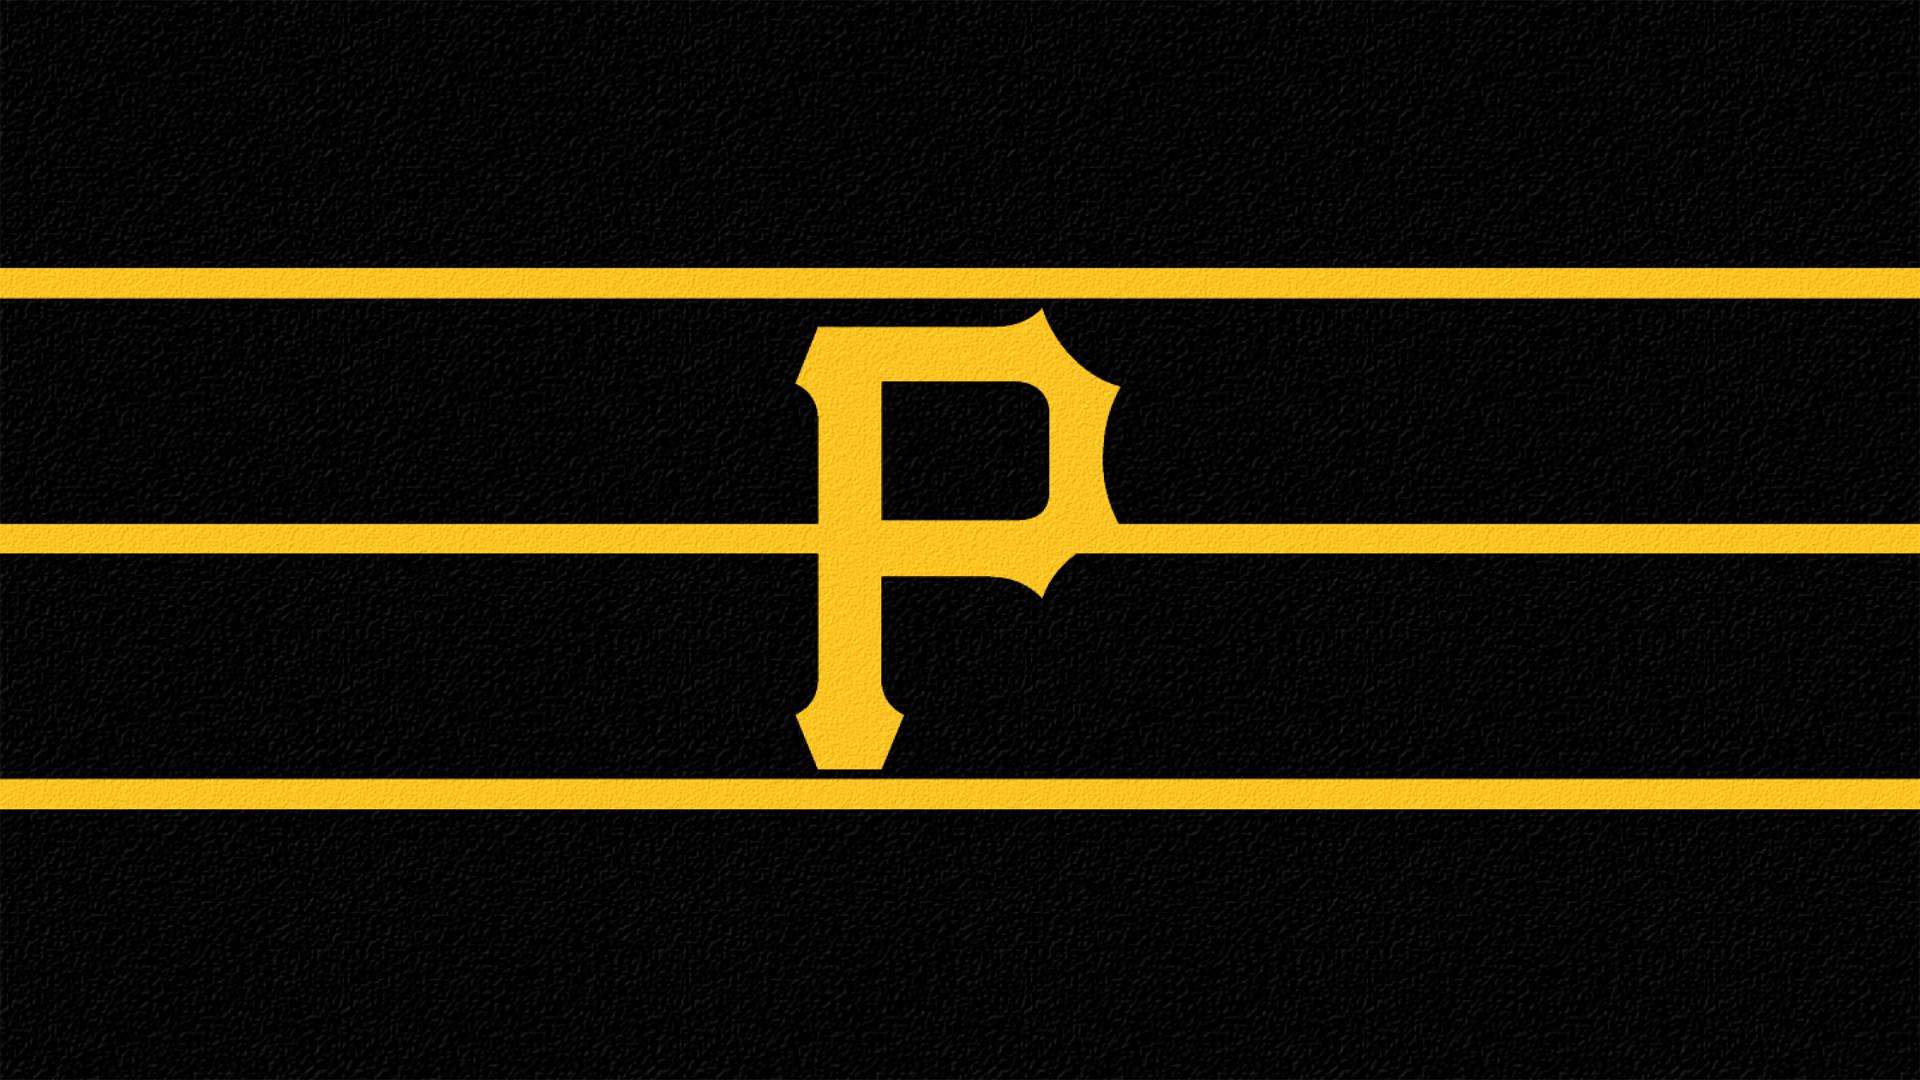 Pittsburgh Pirates Logo HD Wallpaper.